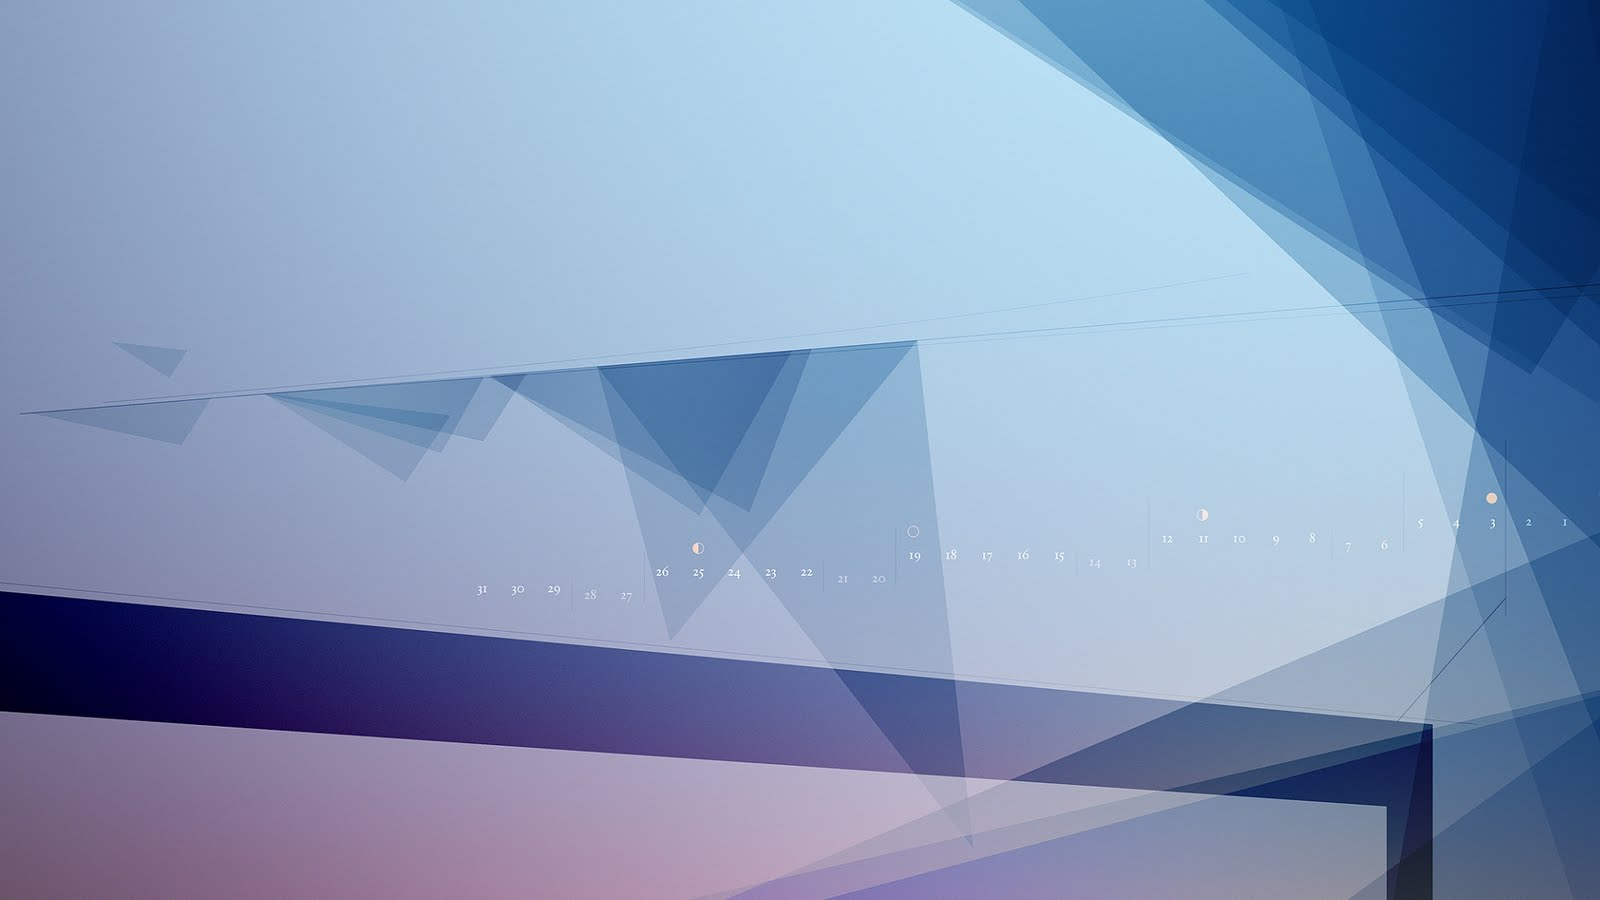 Banco de im genes backgrounds fondos y wallpapers for Wallpapers abstractos